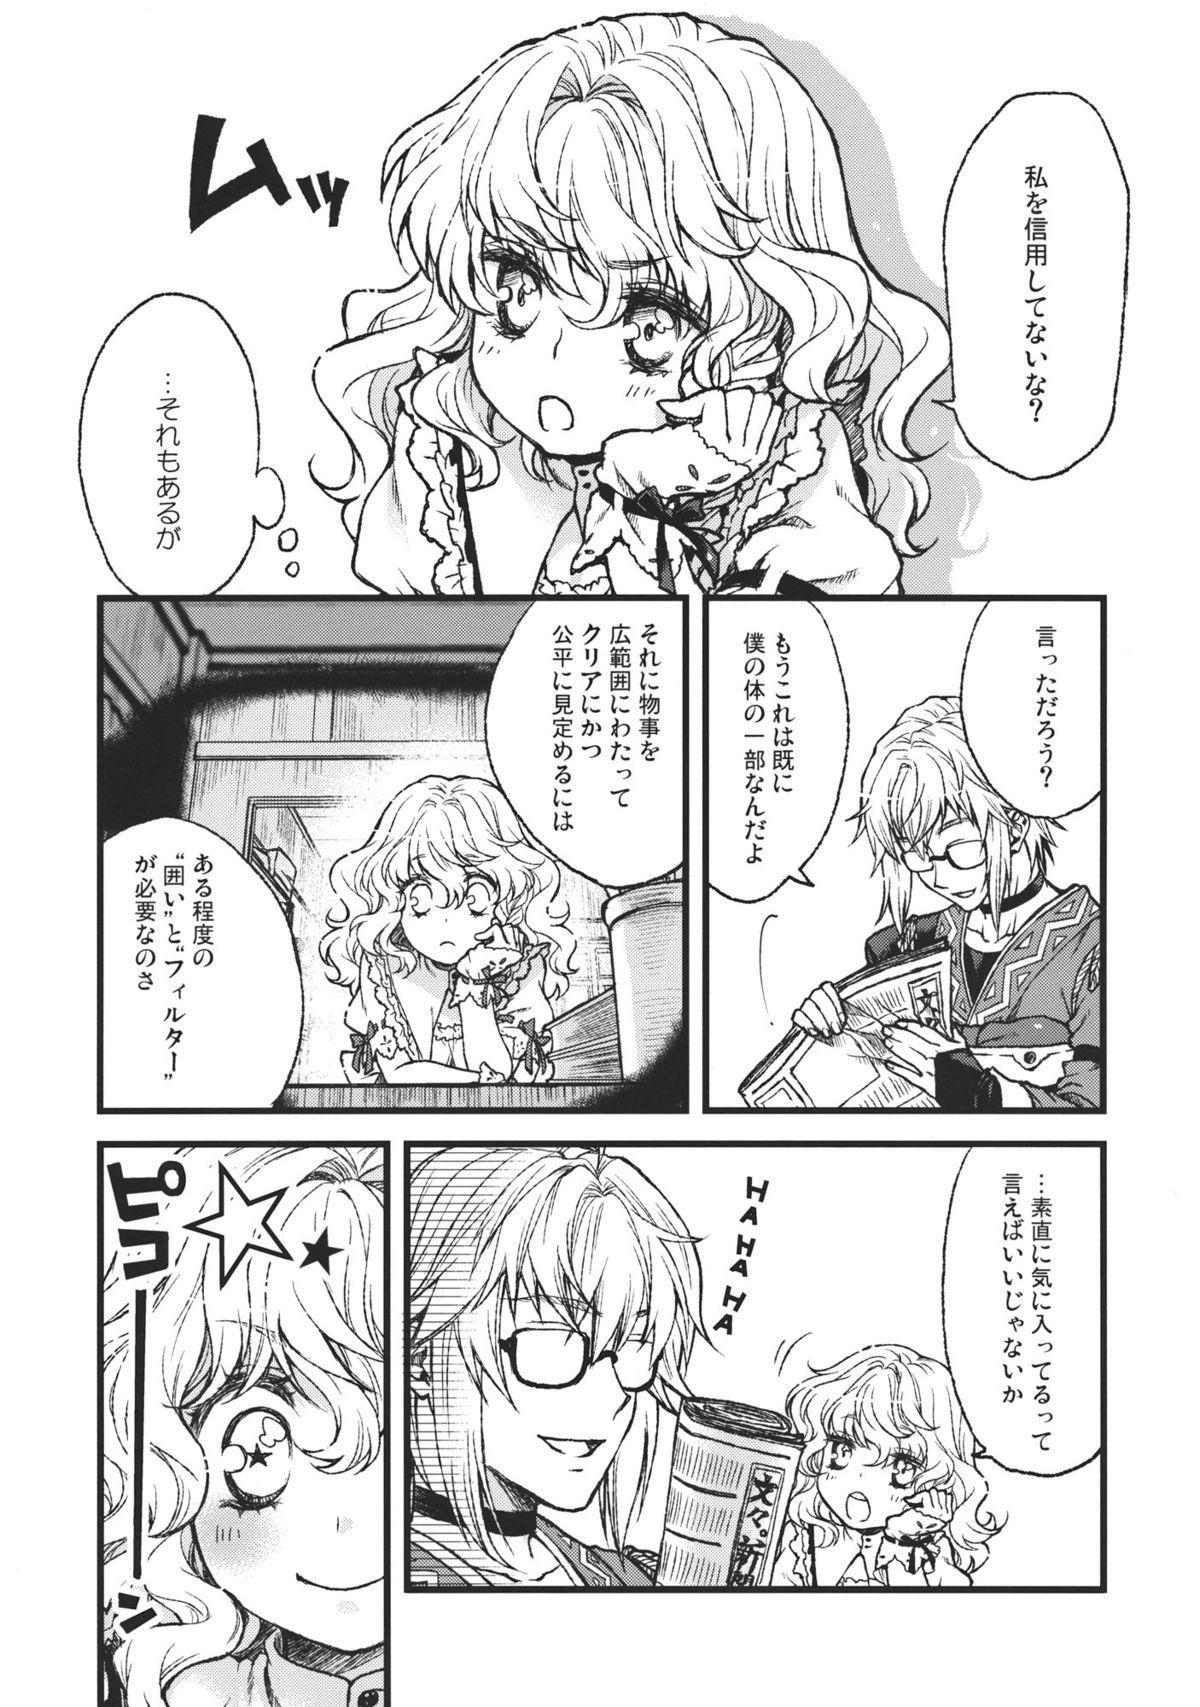 Koimegane / Iromegane 4